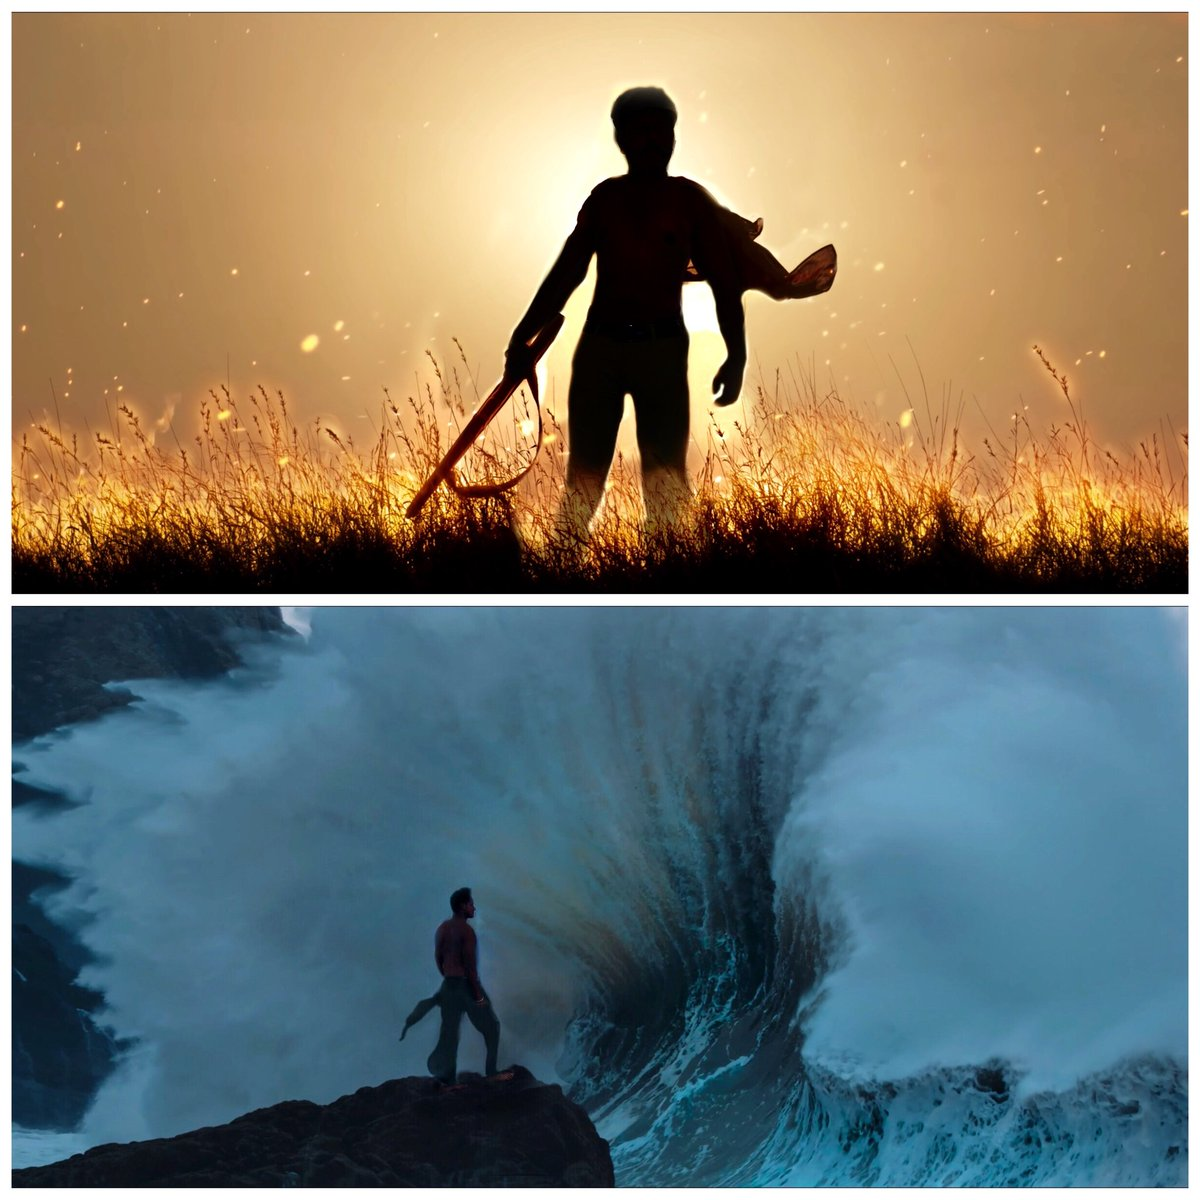 Here are two amazing shots that re-created from @RRRMovie teasers, by me and @thebaluuu  @AlwaysRamCharan @tarak9999 @ssrajamouli @mmkeeravaani #rrr #rrrmovie #BheemForRamaraju #RamarajuForBheem